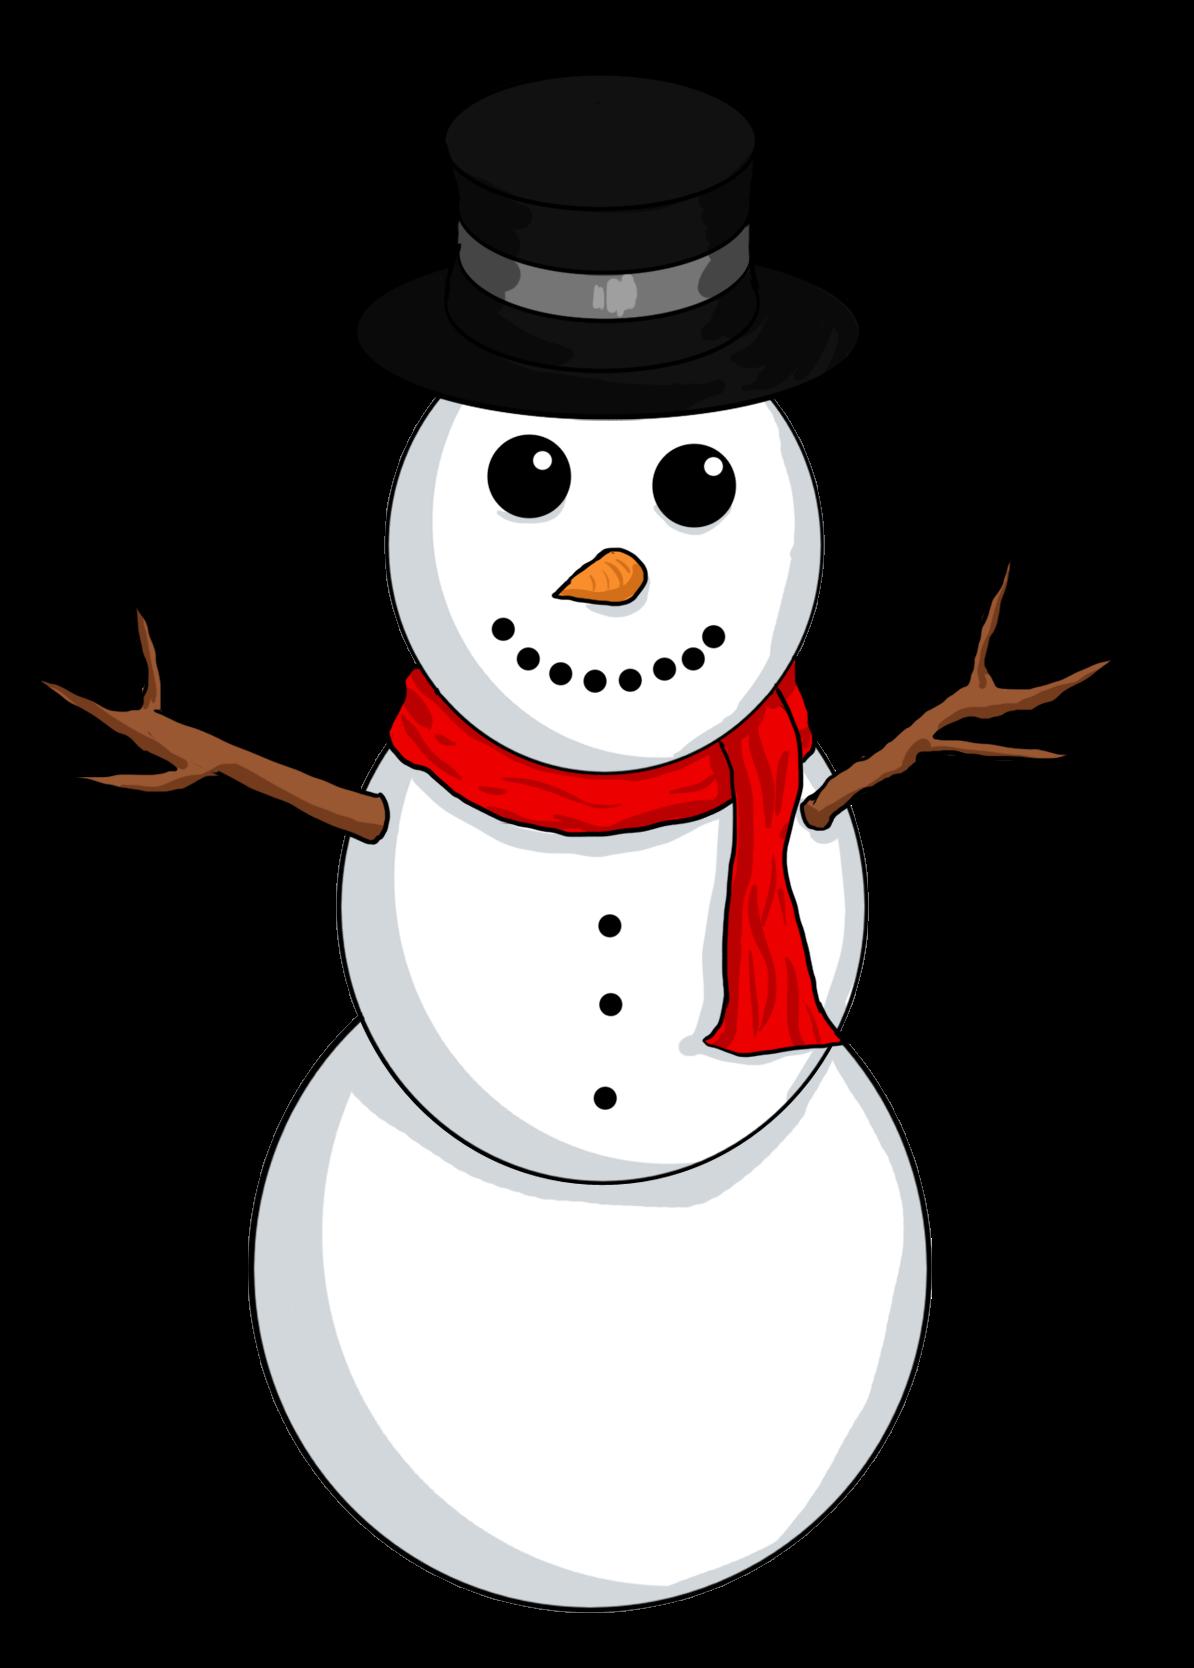 Snowman Clipart Snowman Clipart Free-Snowman clipart snowman clipart free-12